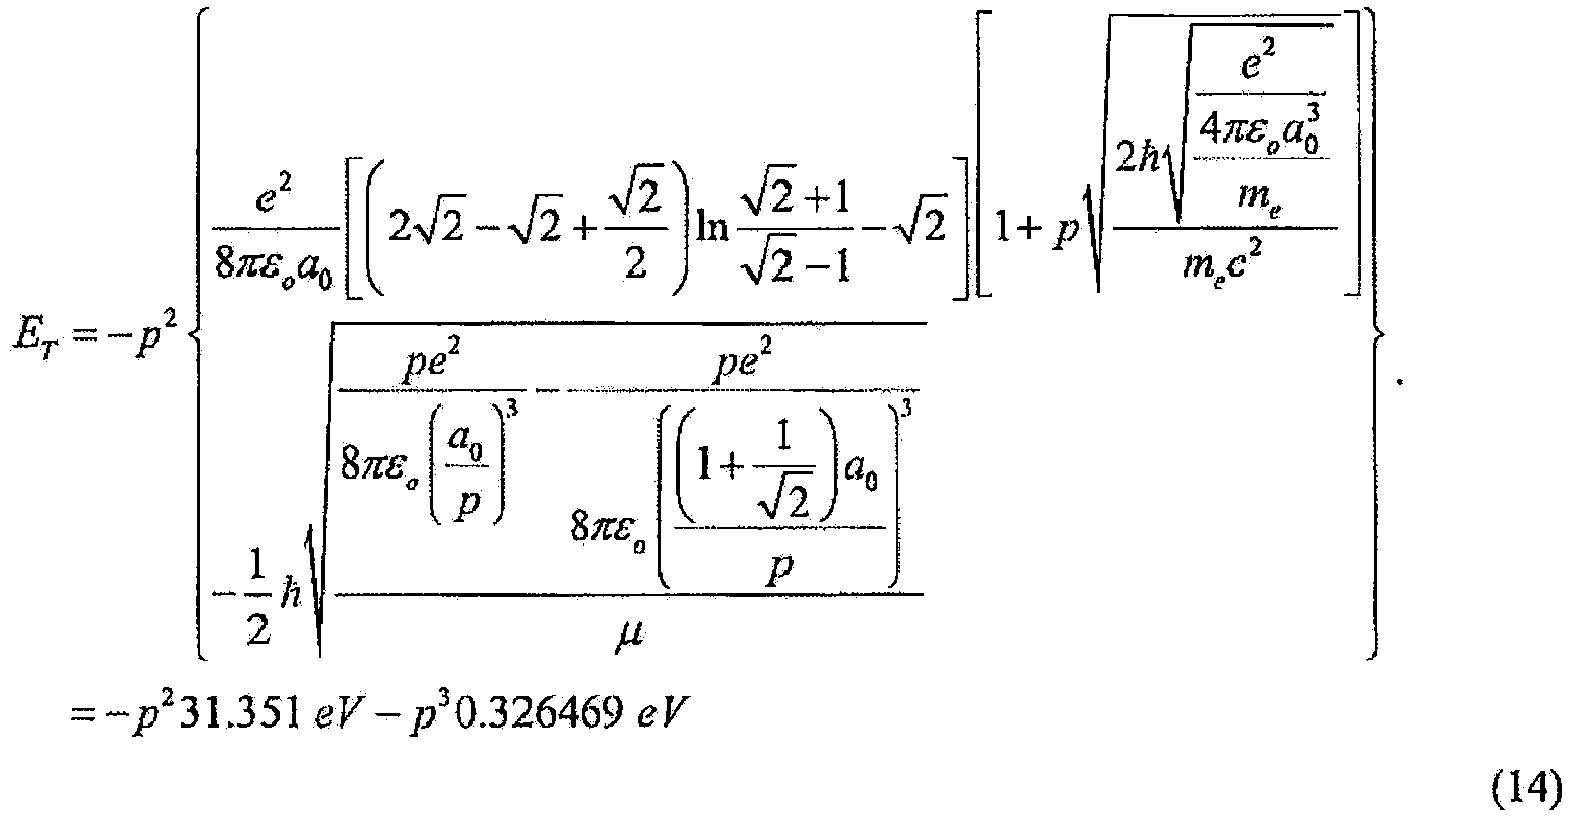 Ep2966723a1 Heterogeneous Hydrogen Catalyst Power System Google Windshield Wipers 124 1241 Wiring Diagram Figure Imgb0024